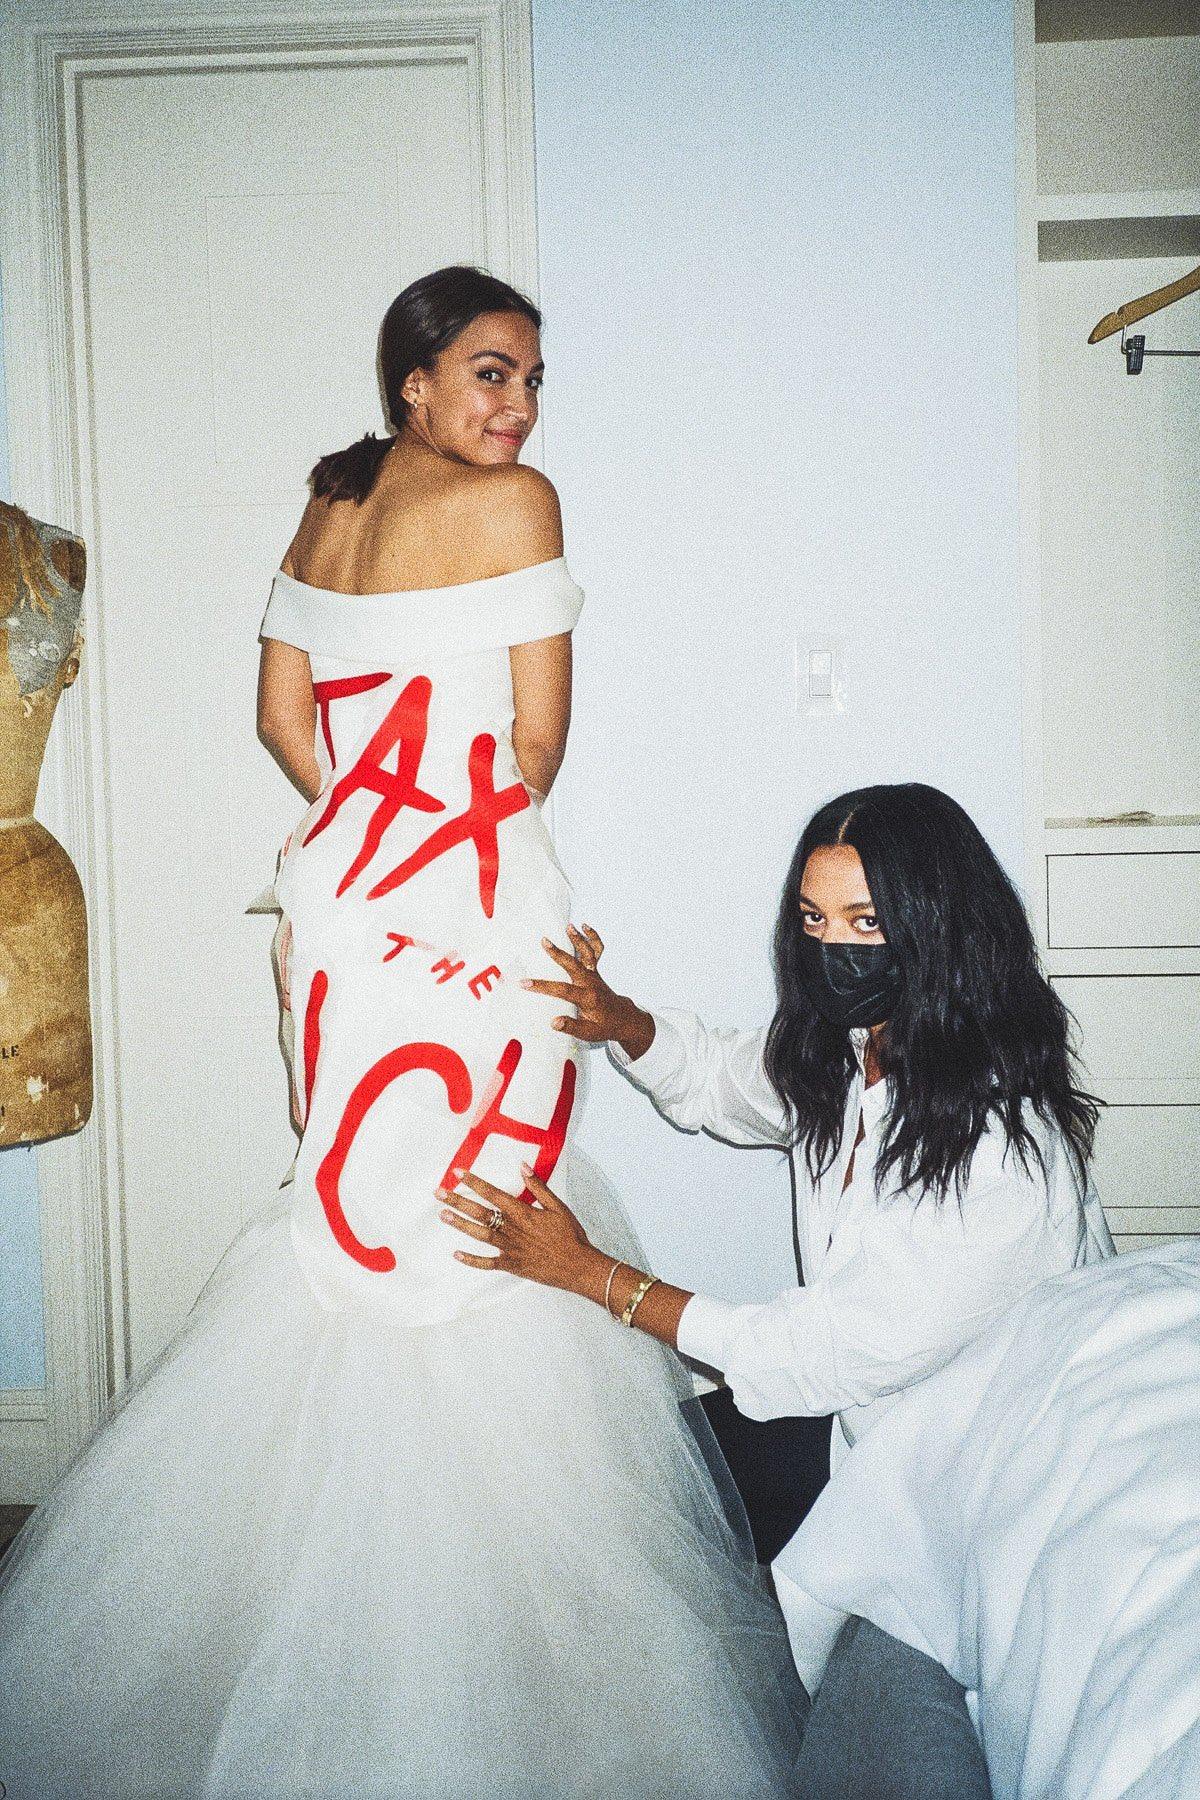 Hypocrisy in action! AOC models a dress she will wear to a $30,000 per ticket gala. (Photo: Alexandria Ocasio-Cortez Twitter)